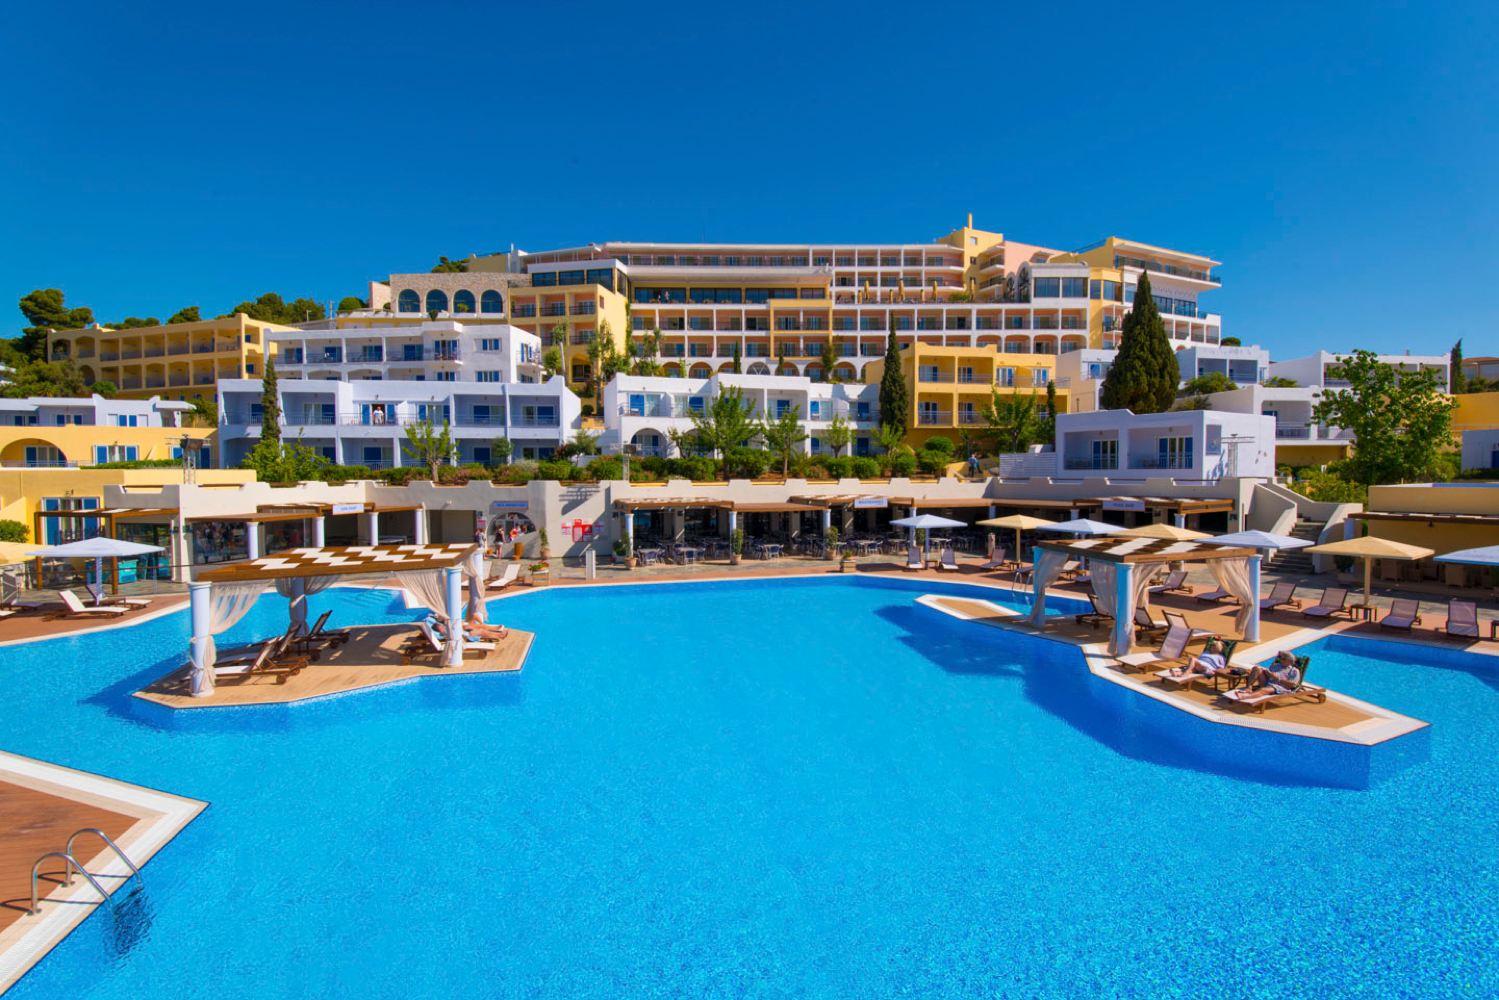 Aquis Mare Nostrum Hotel, Thalasso, Greece